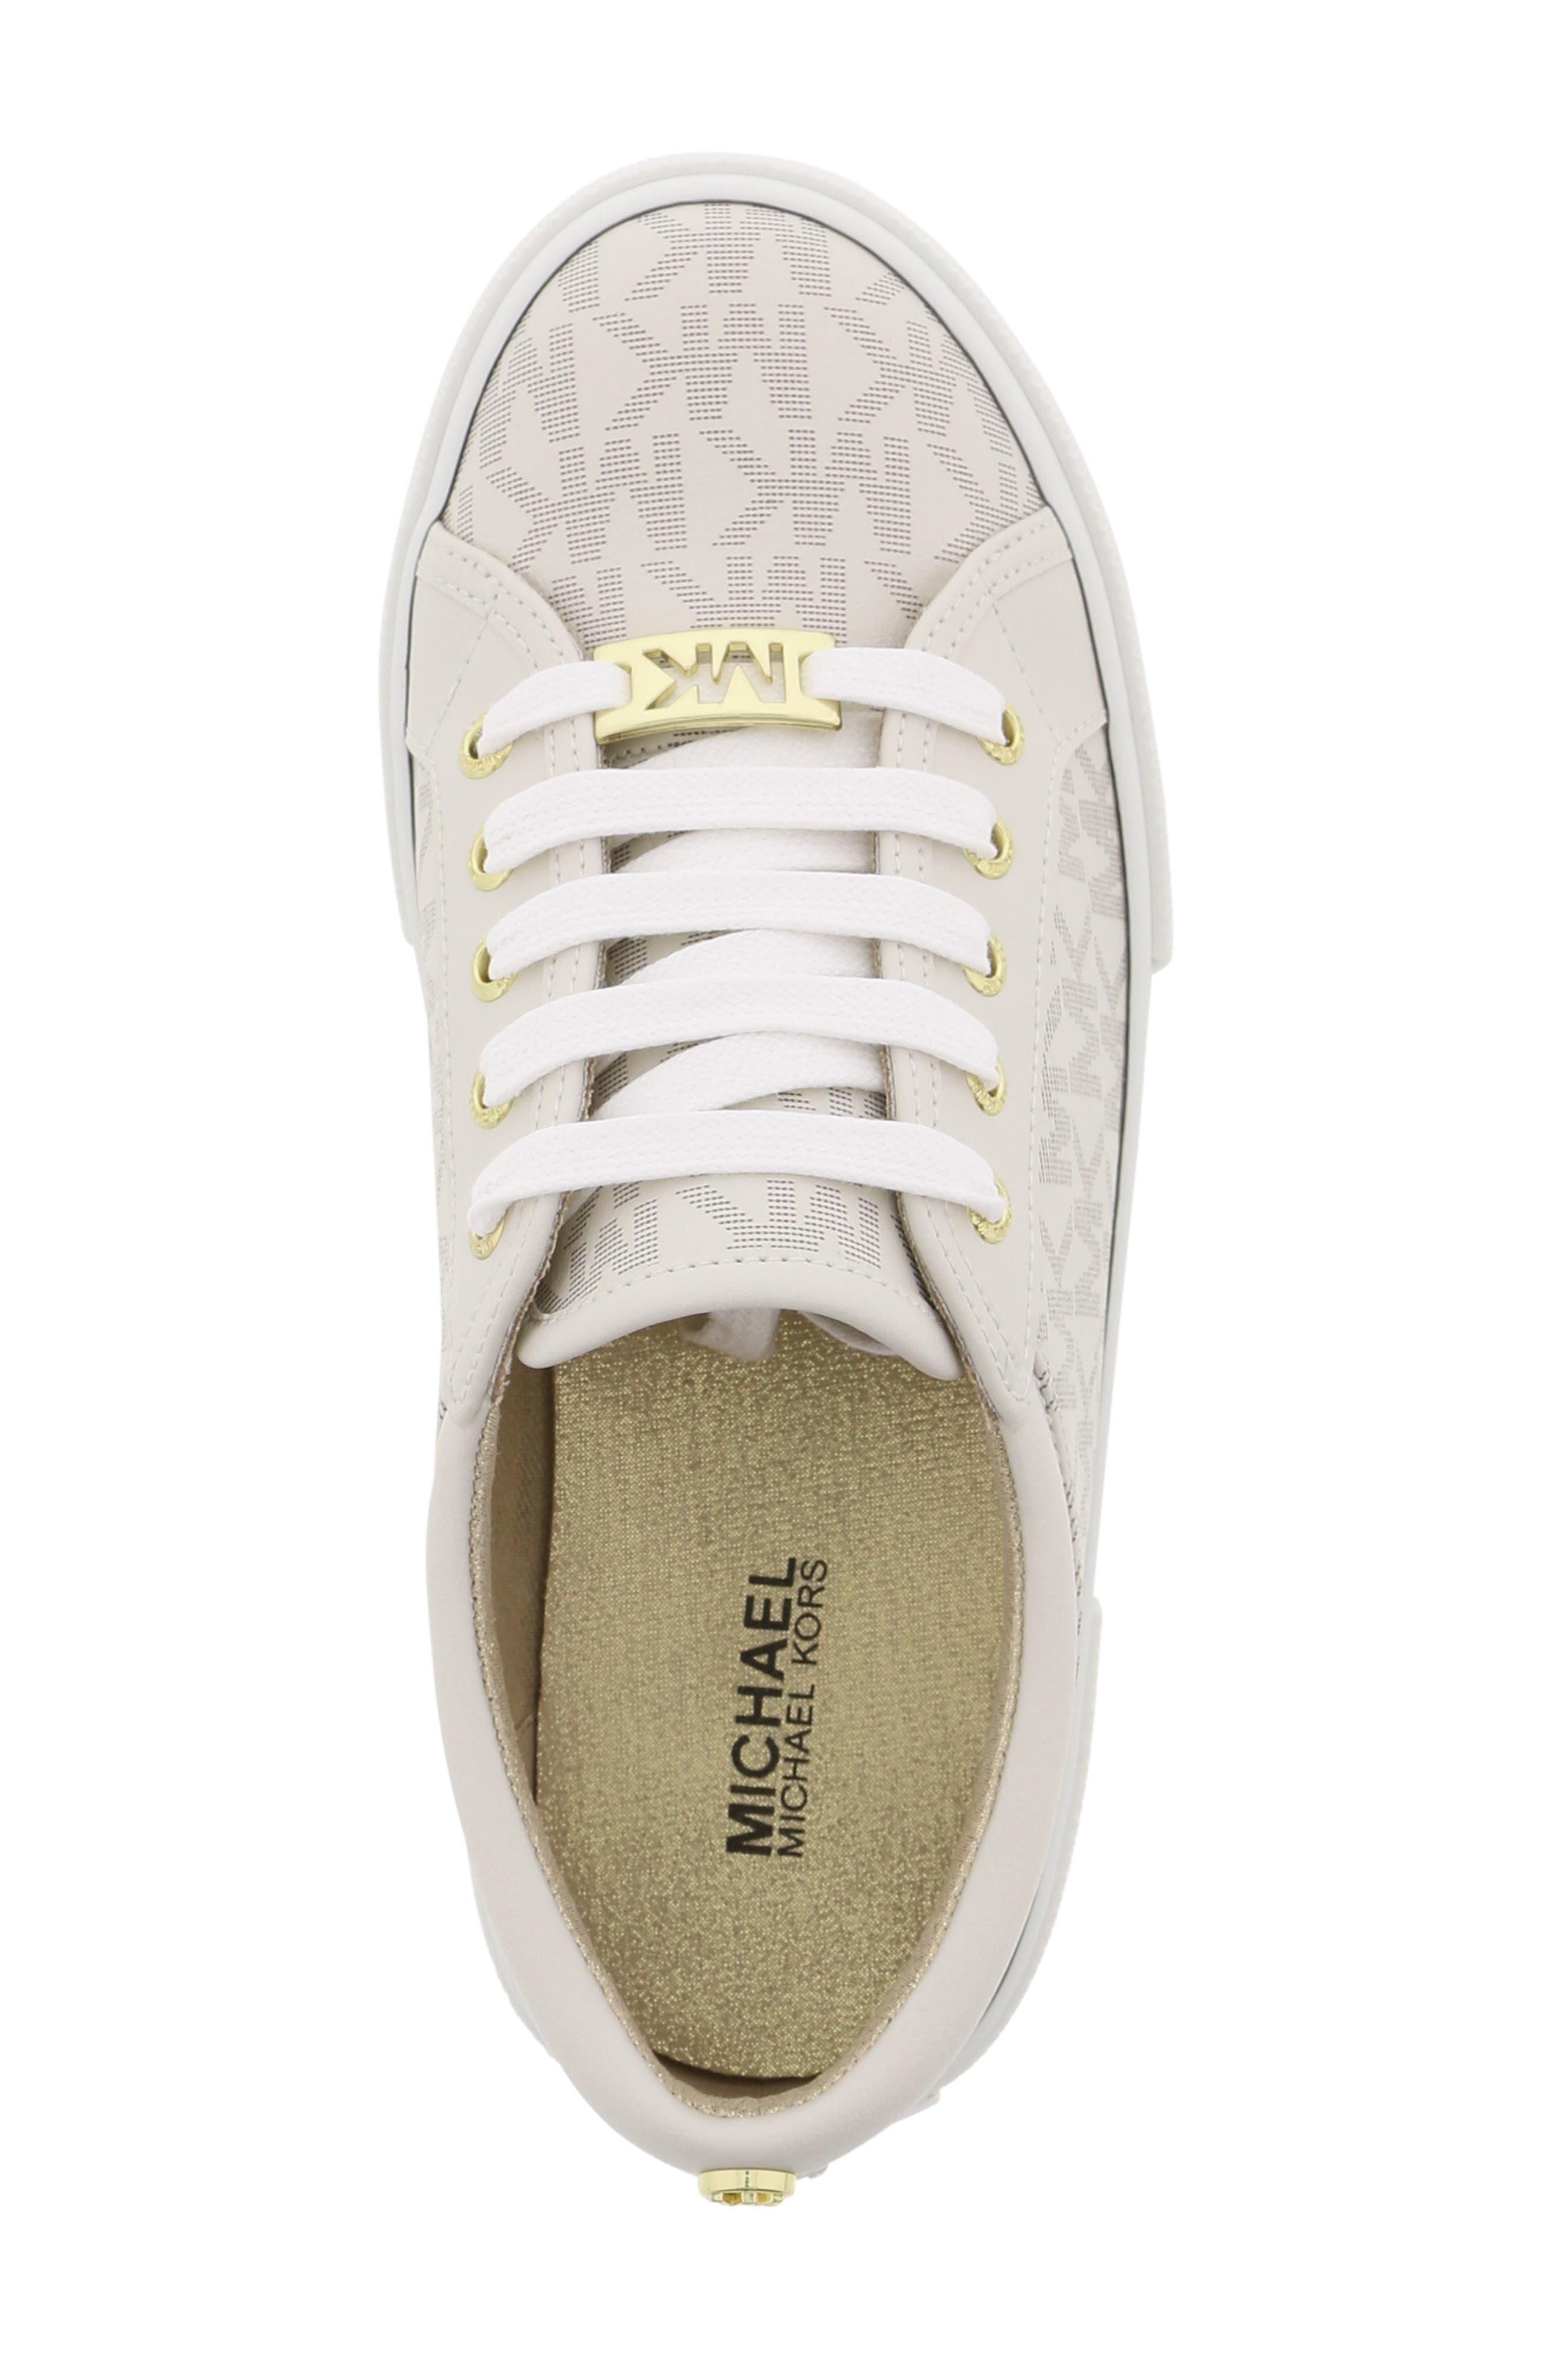 MICHAEL MICHAEL KORS,                             Ima Rebel Sneaker,                             Alternate thumbnail 5, color,                             VANILLA